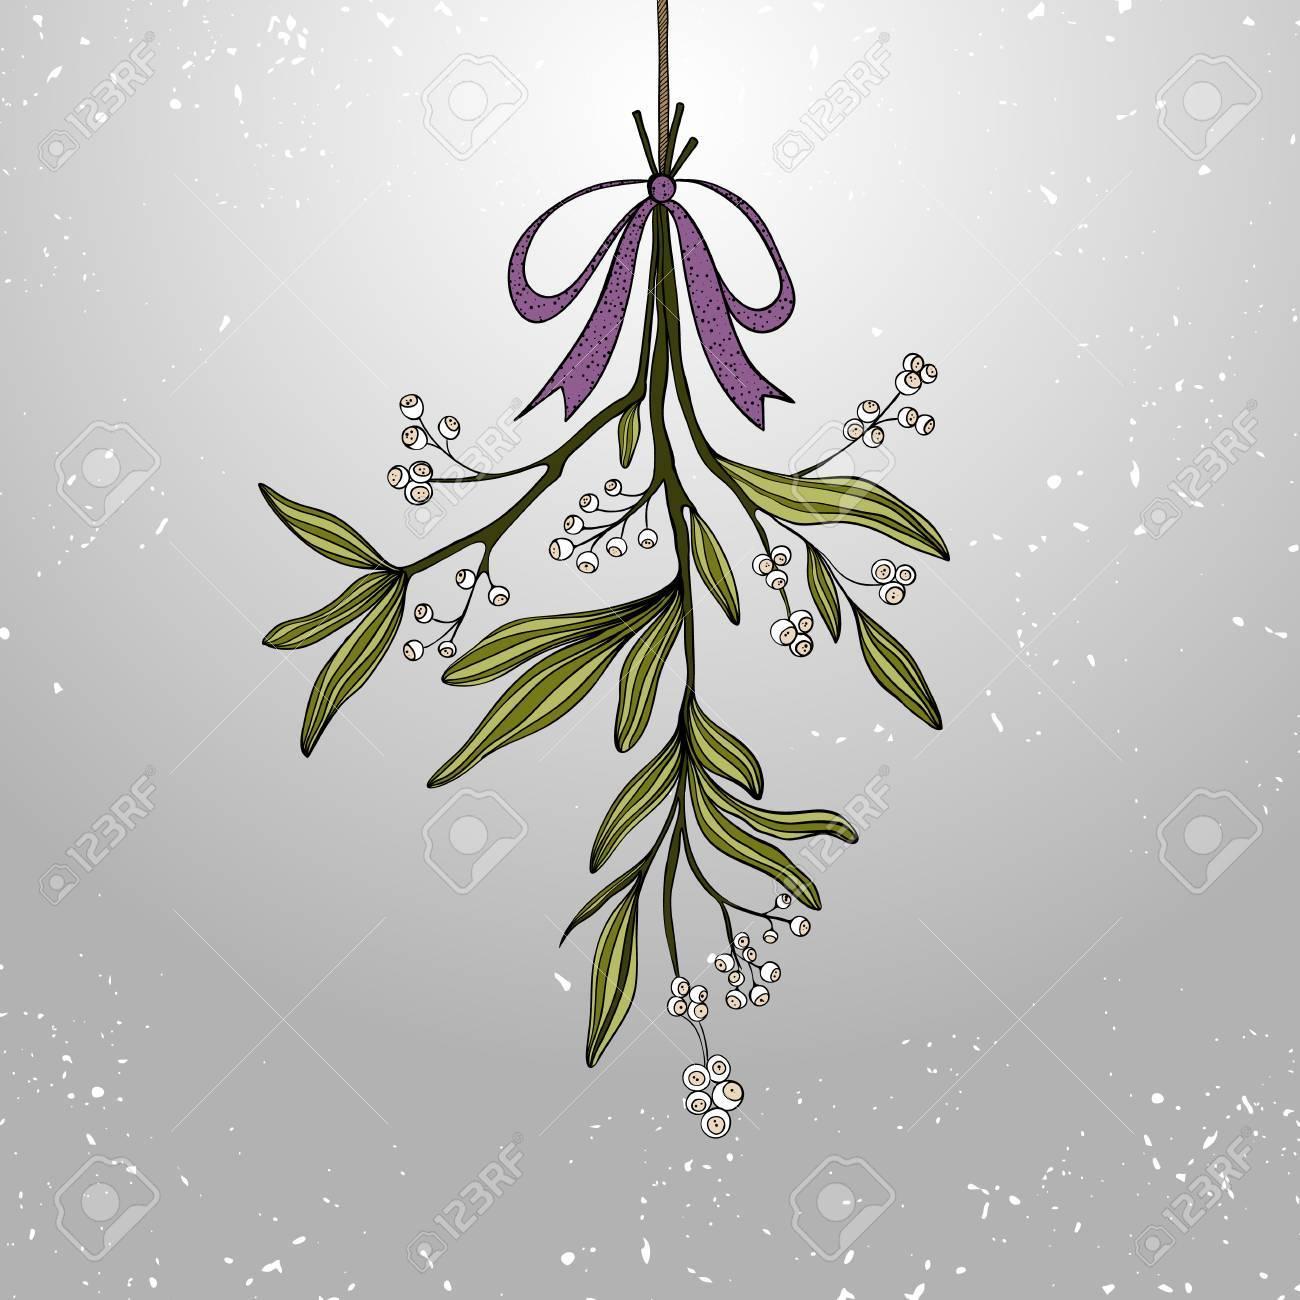 Hand Drawn Mistletoe. Vector Christmas Plant Background. Romantic ...